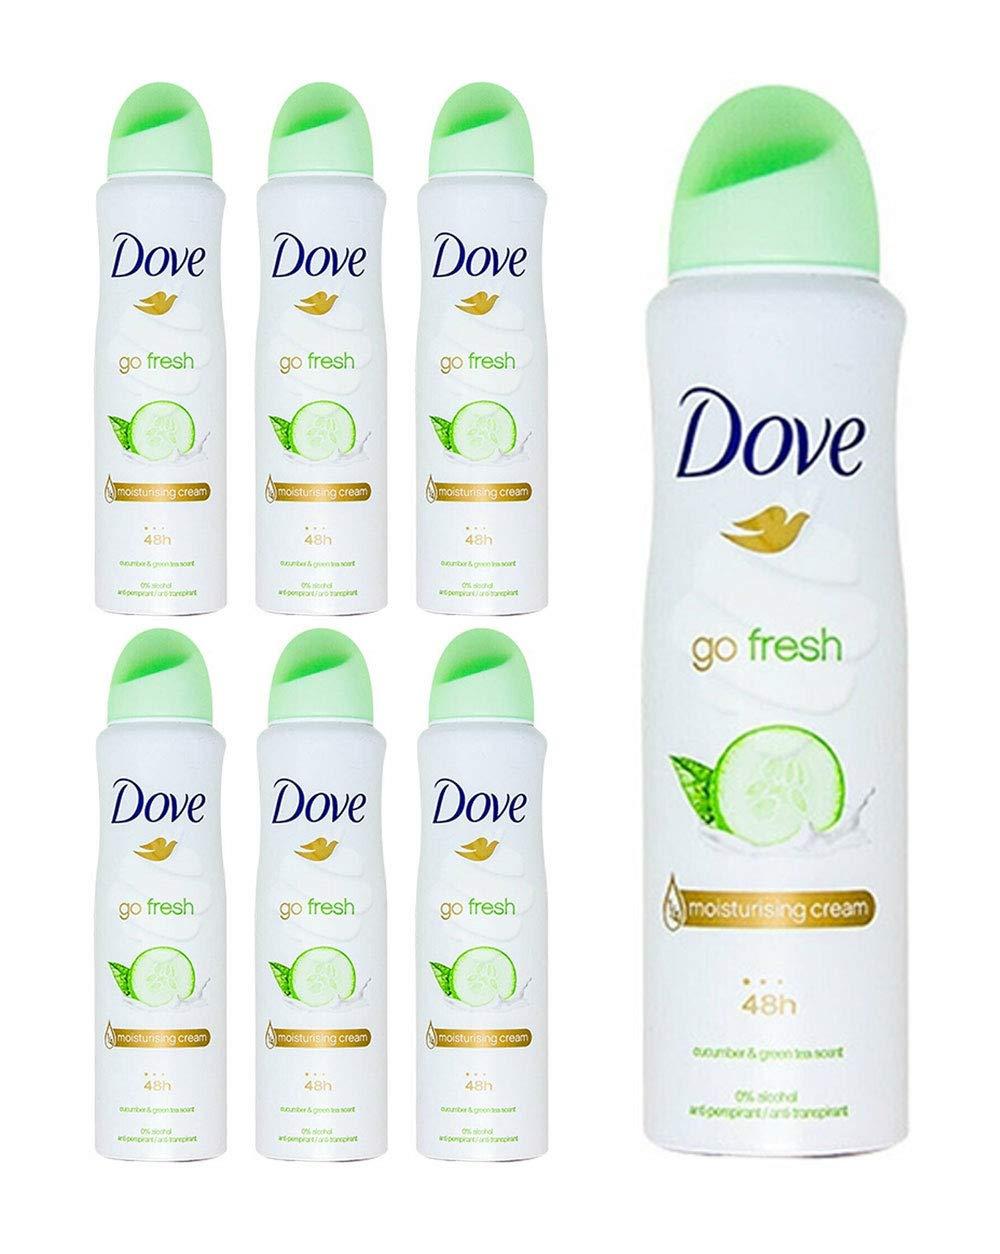 Dove Antiperspirant Deodorant Spray Moisturizing Cucumber & Green Tea 5oz, 10ct